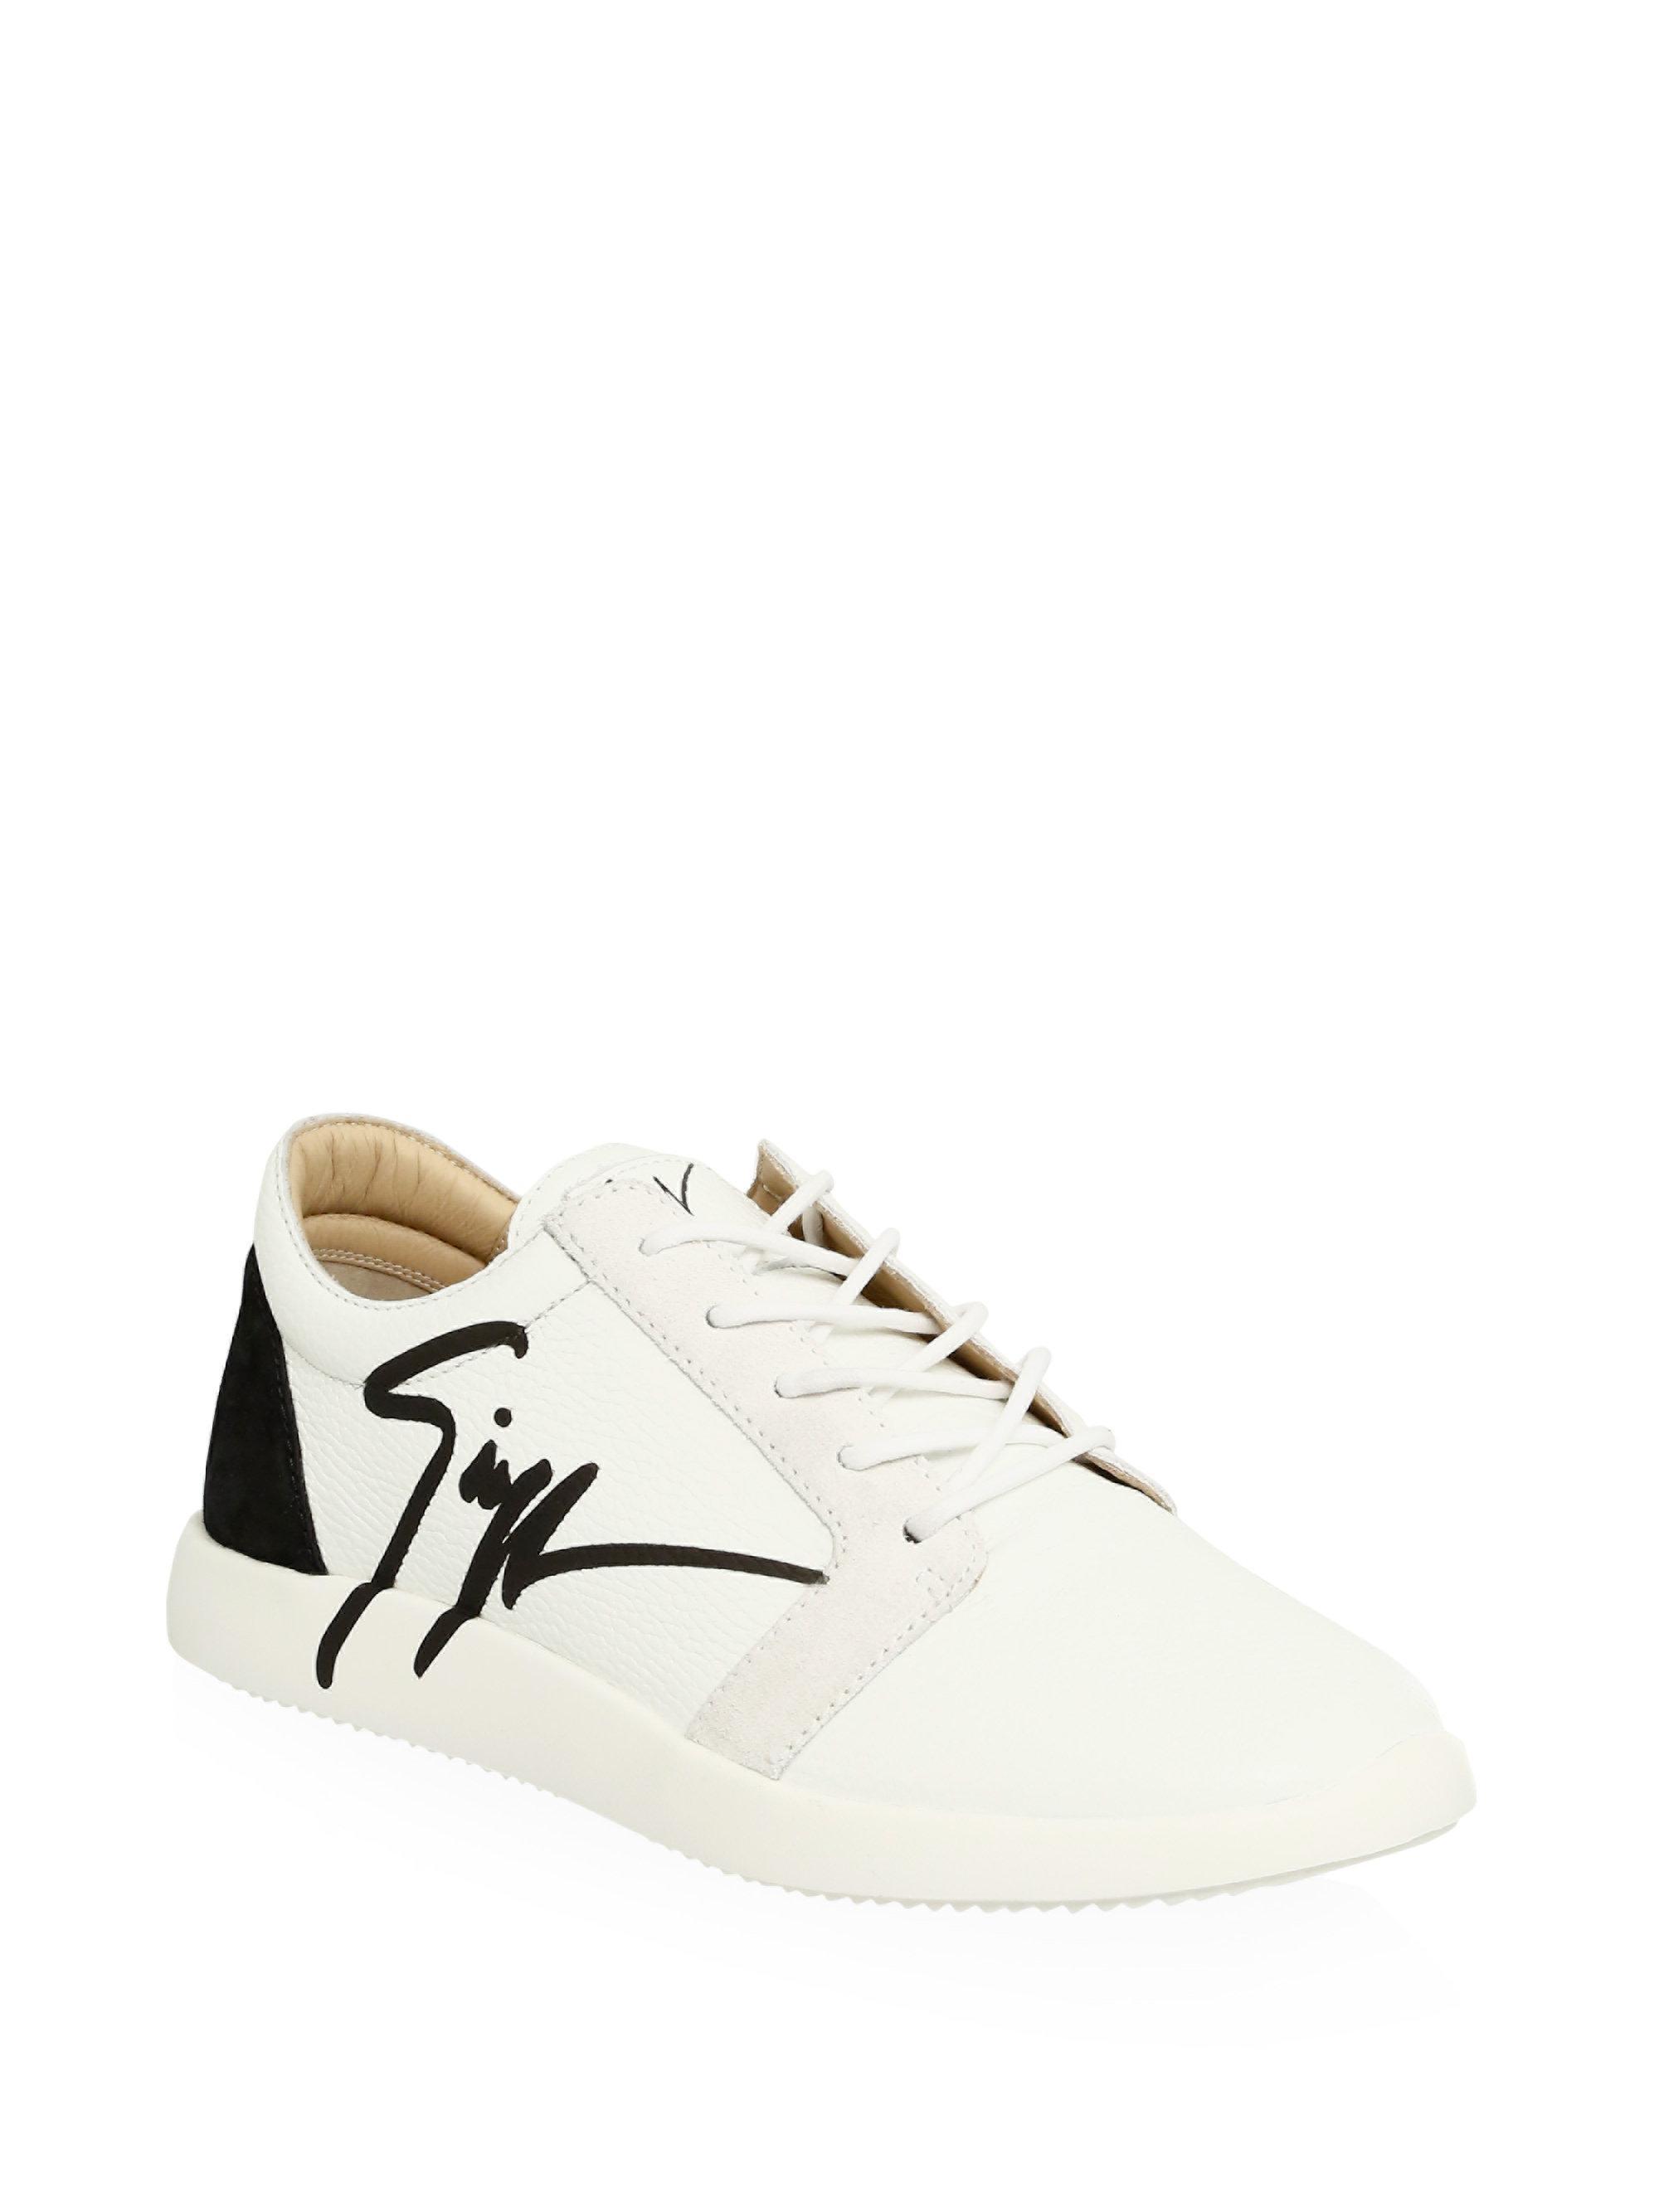 Giuseppe ZanottiColorblock Leather Sneakers 3fGV1NRUA